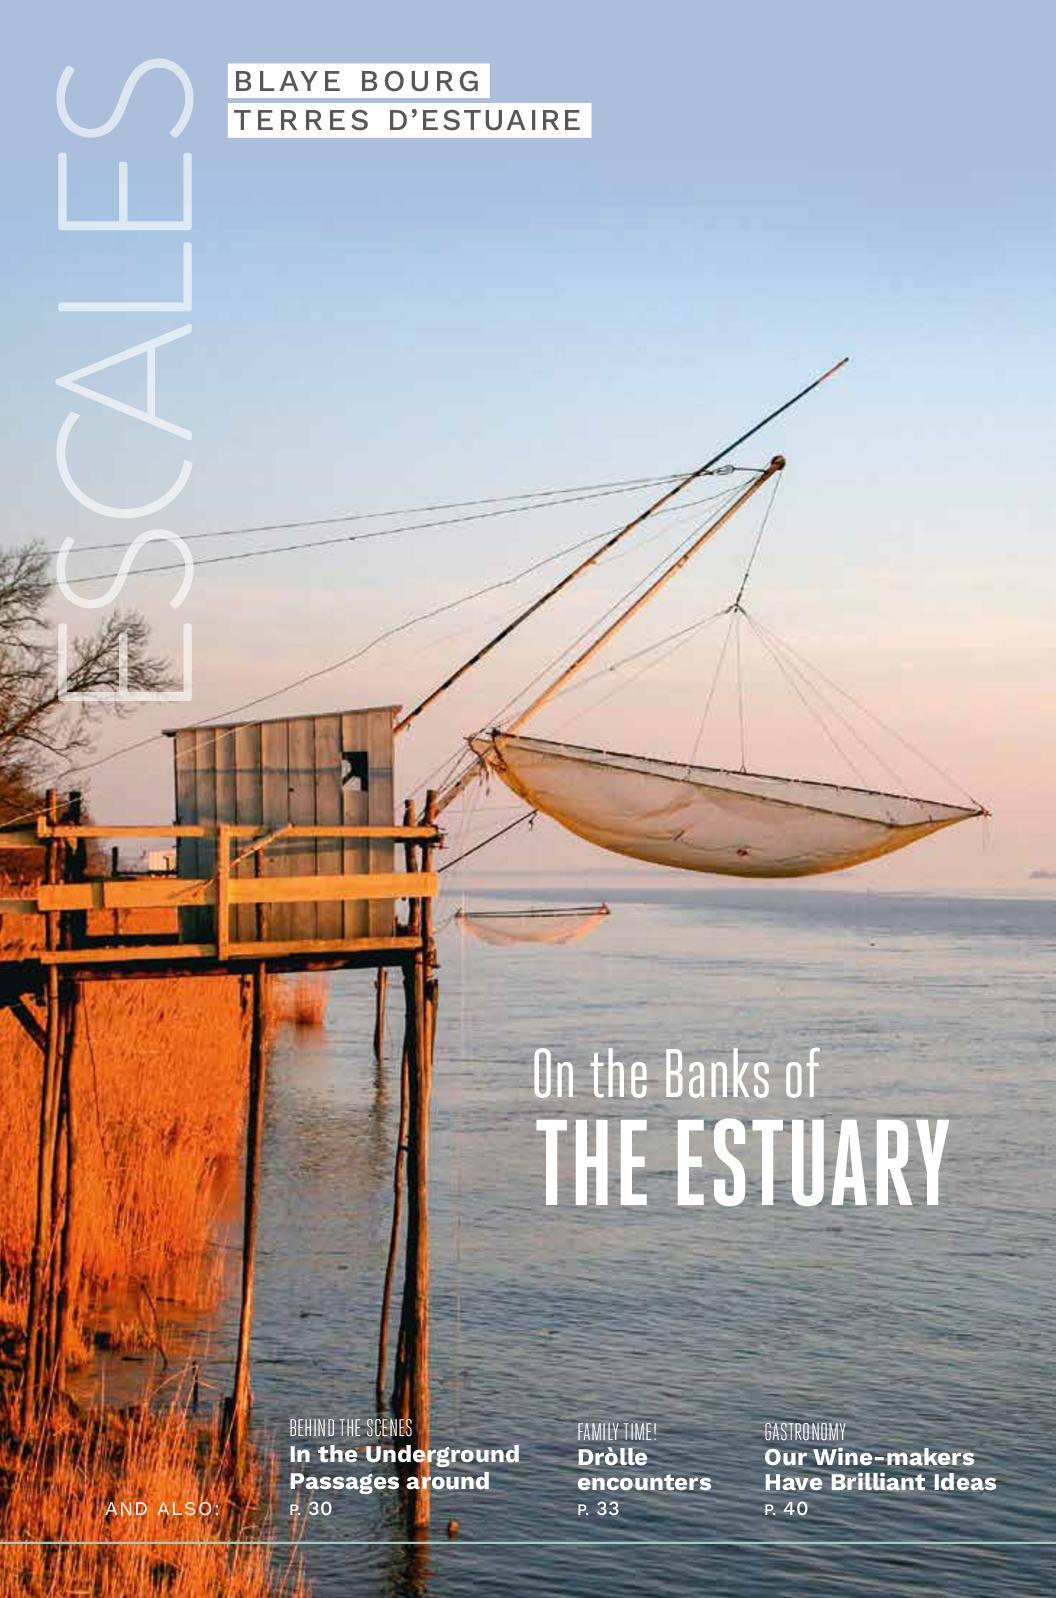 Calaméo - Blaye Bourg Terres d'estuaire - Magazine 2019 UK